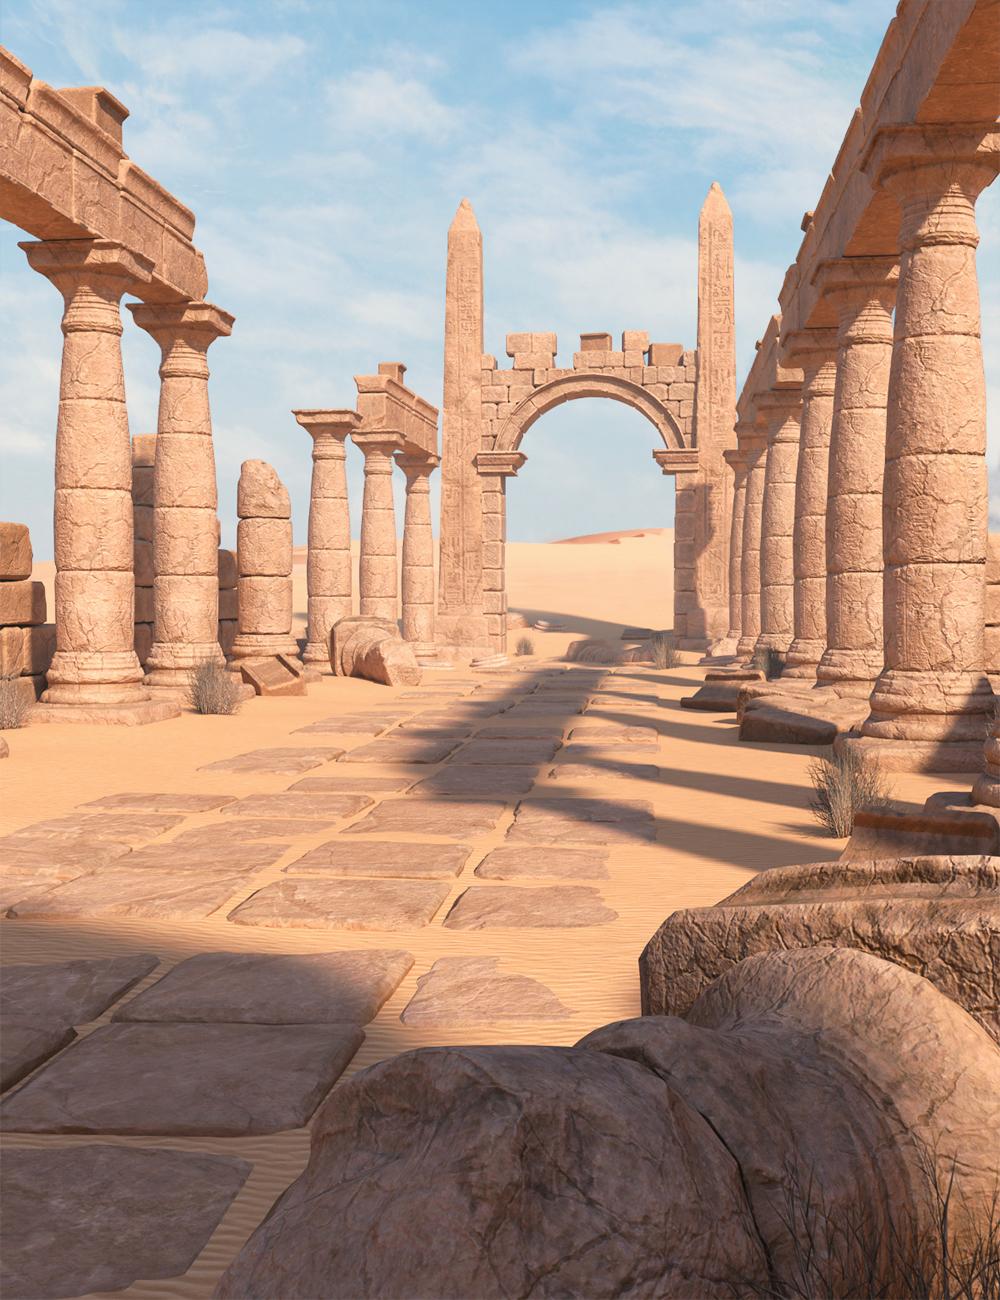 Desert Ruin by: 3dLab, 3D Models by Daz 3D